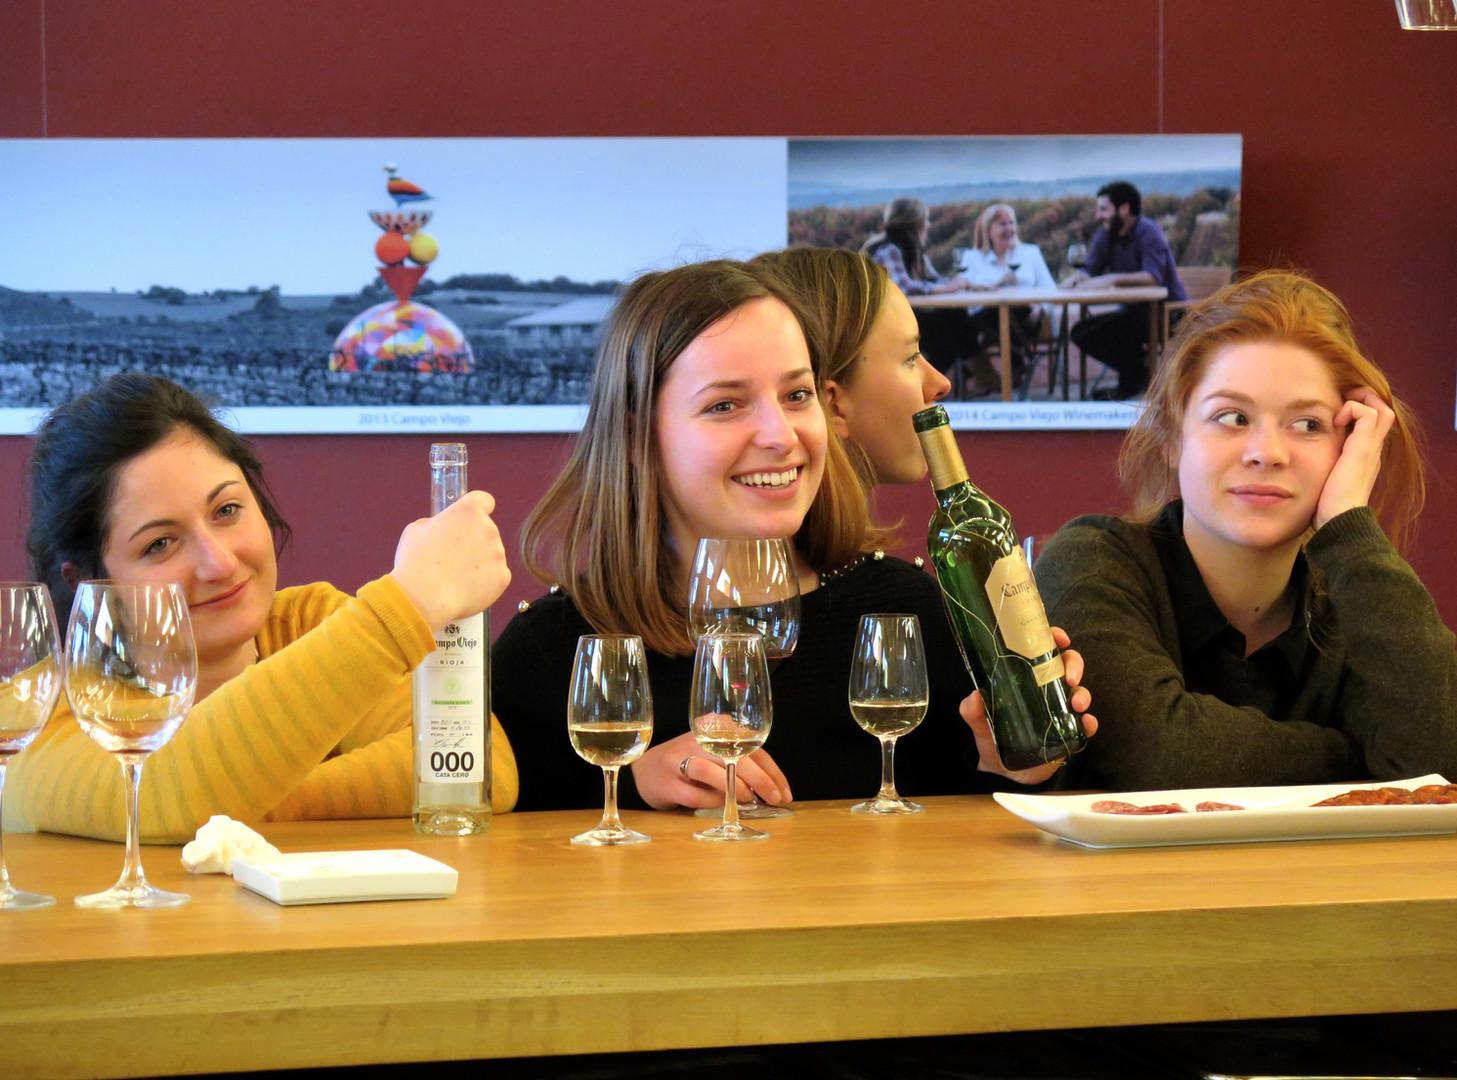 Voyage etude Irouleguy Rioja 201835.JPG